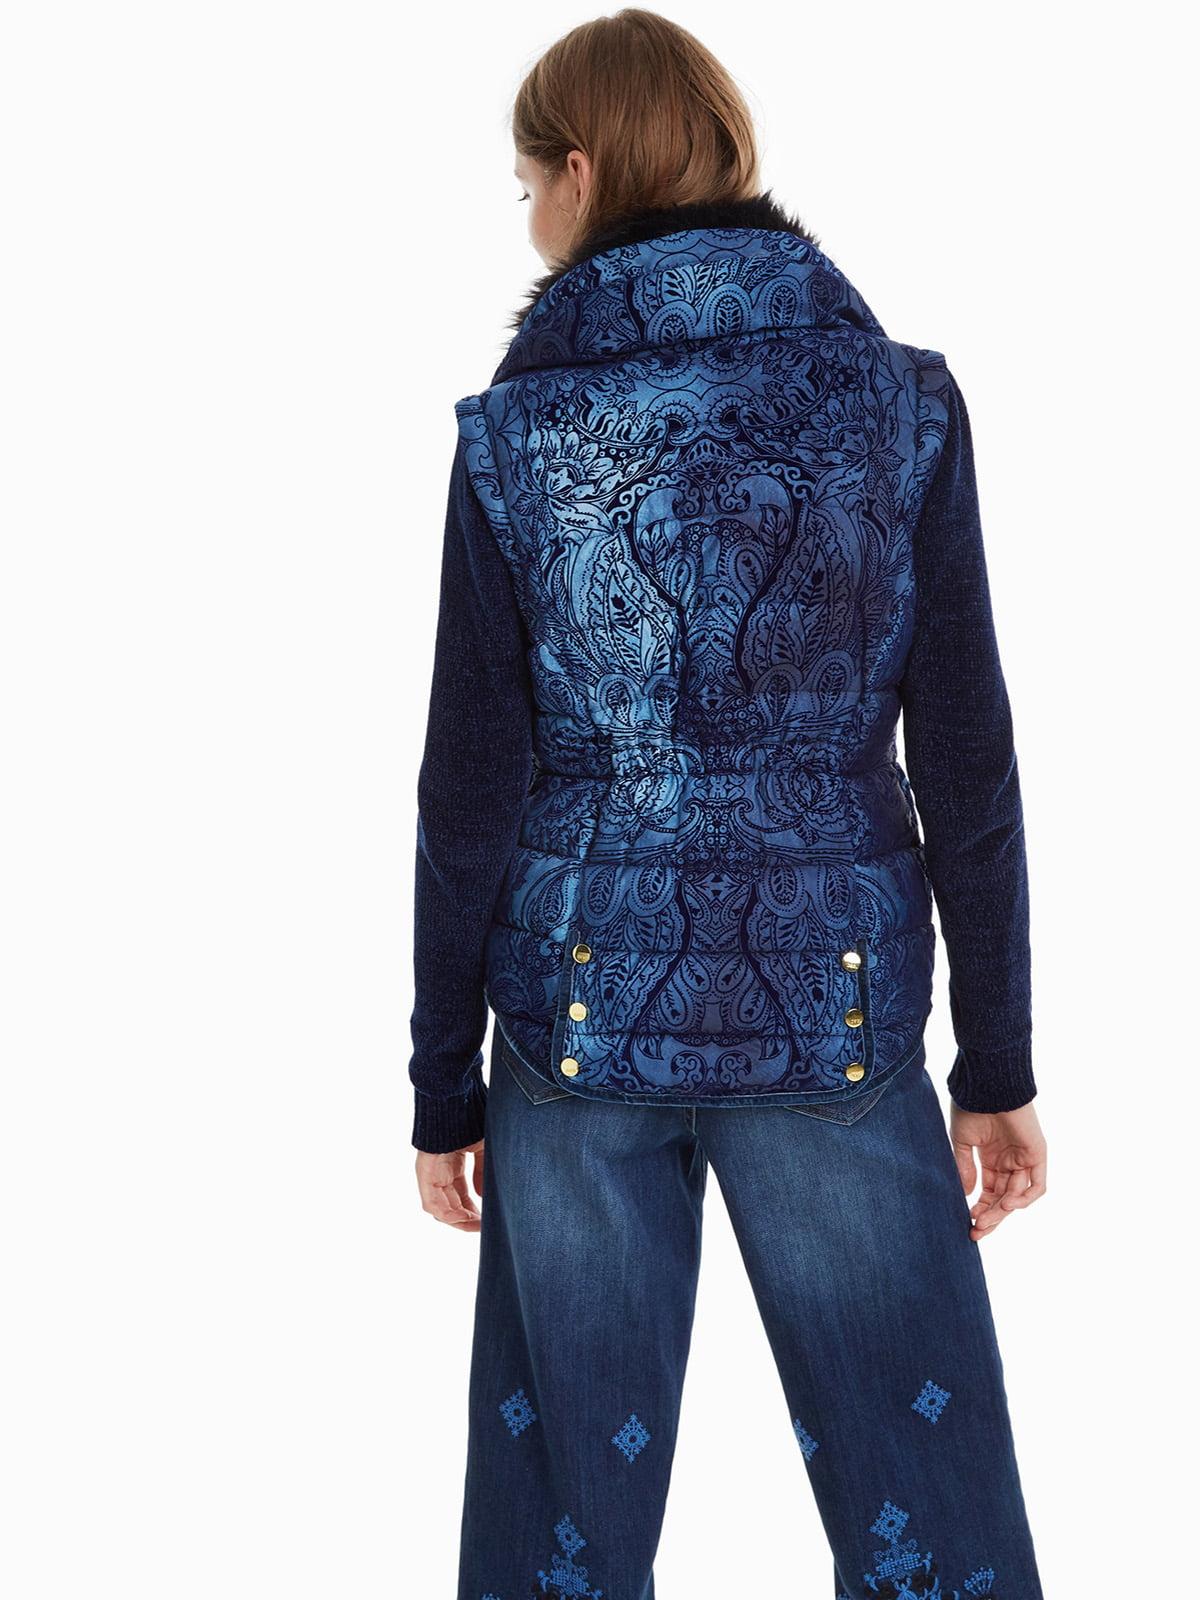 Куртка синя з принтом | 4524254 | фото 3